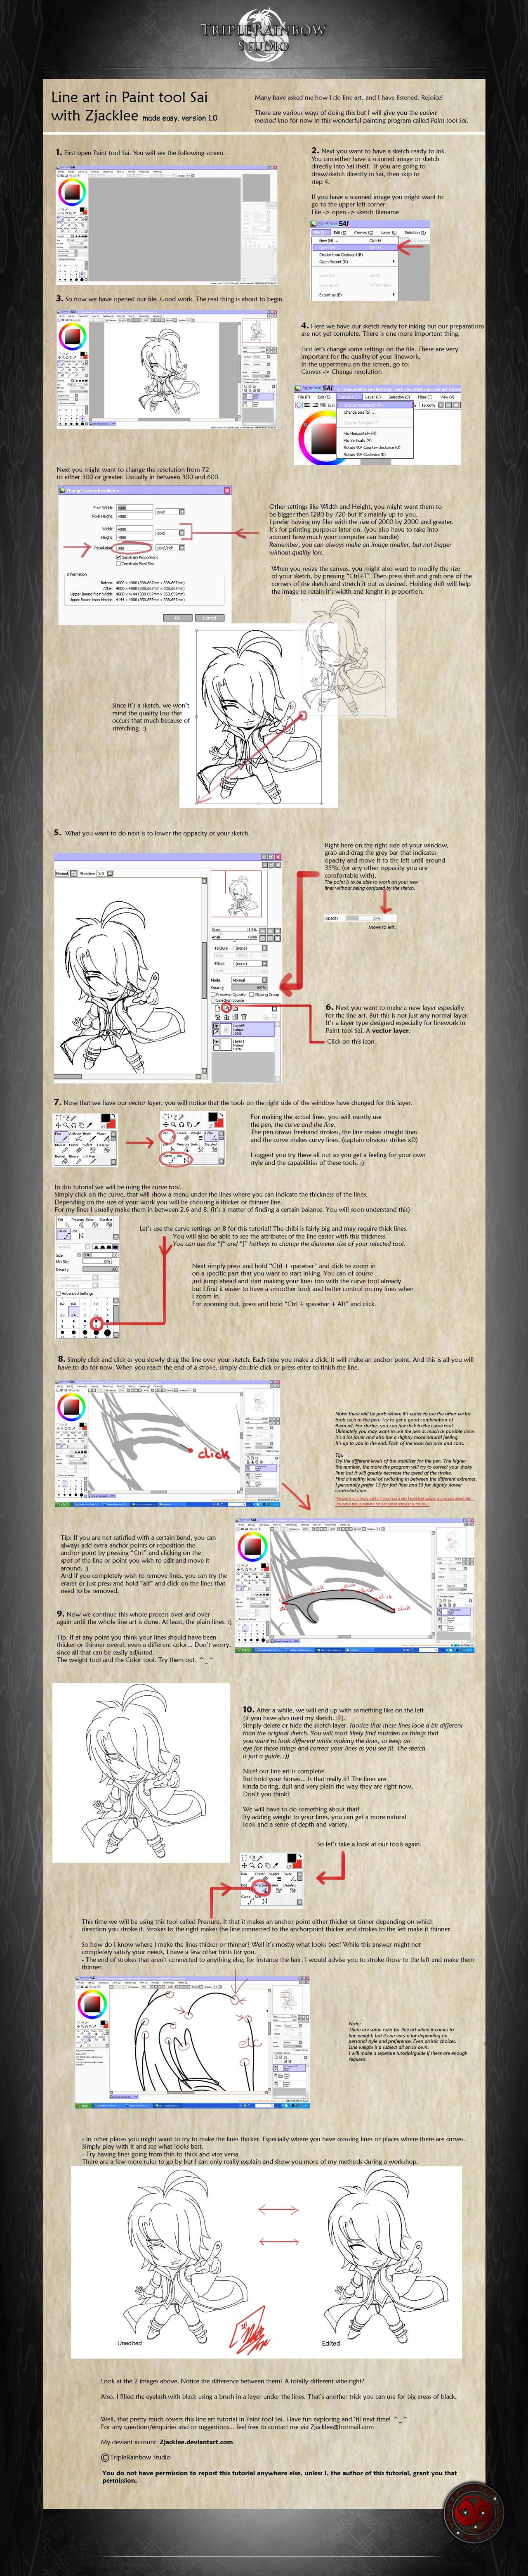 One Line Art Tutorial : Lineart on drawing tutorials deviantart